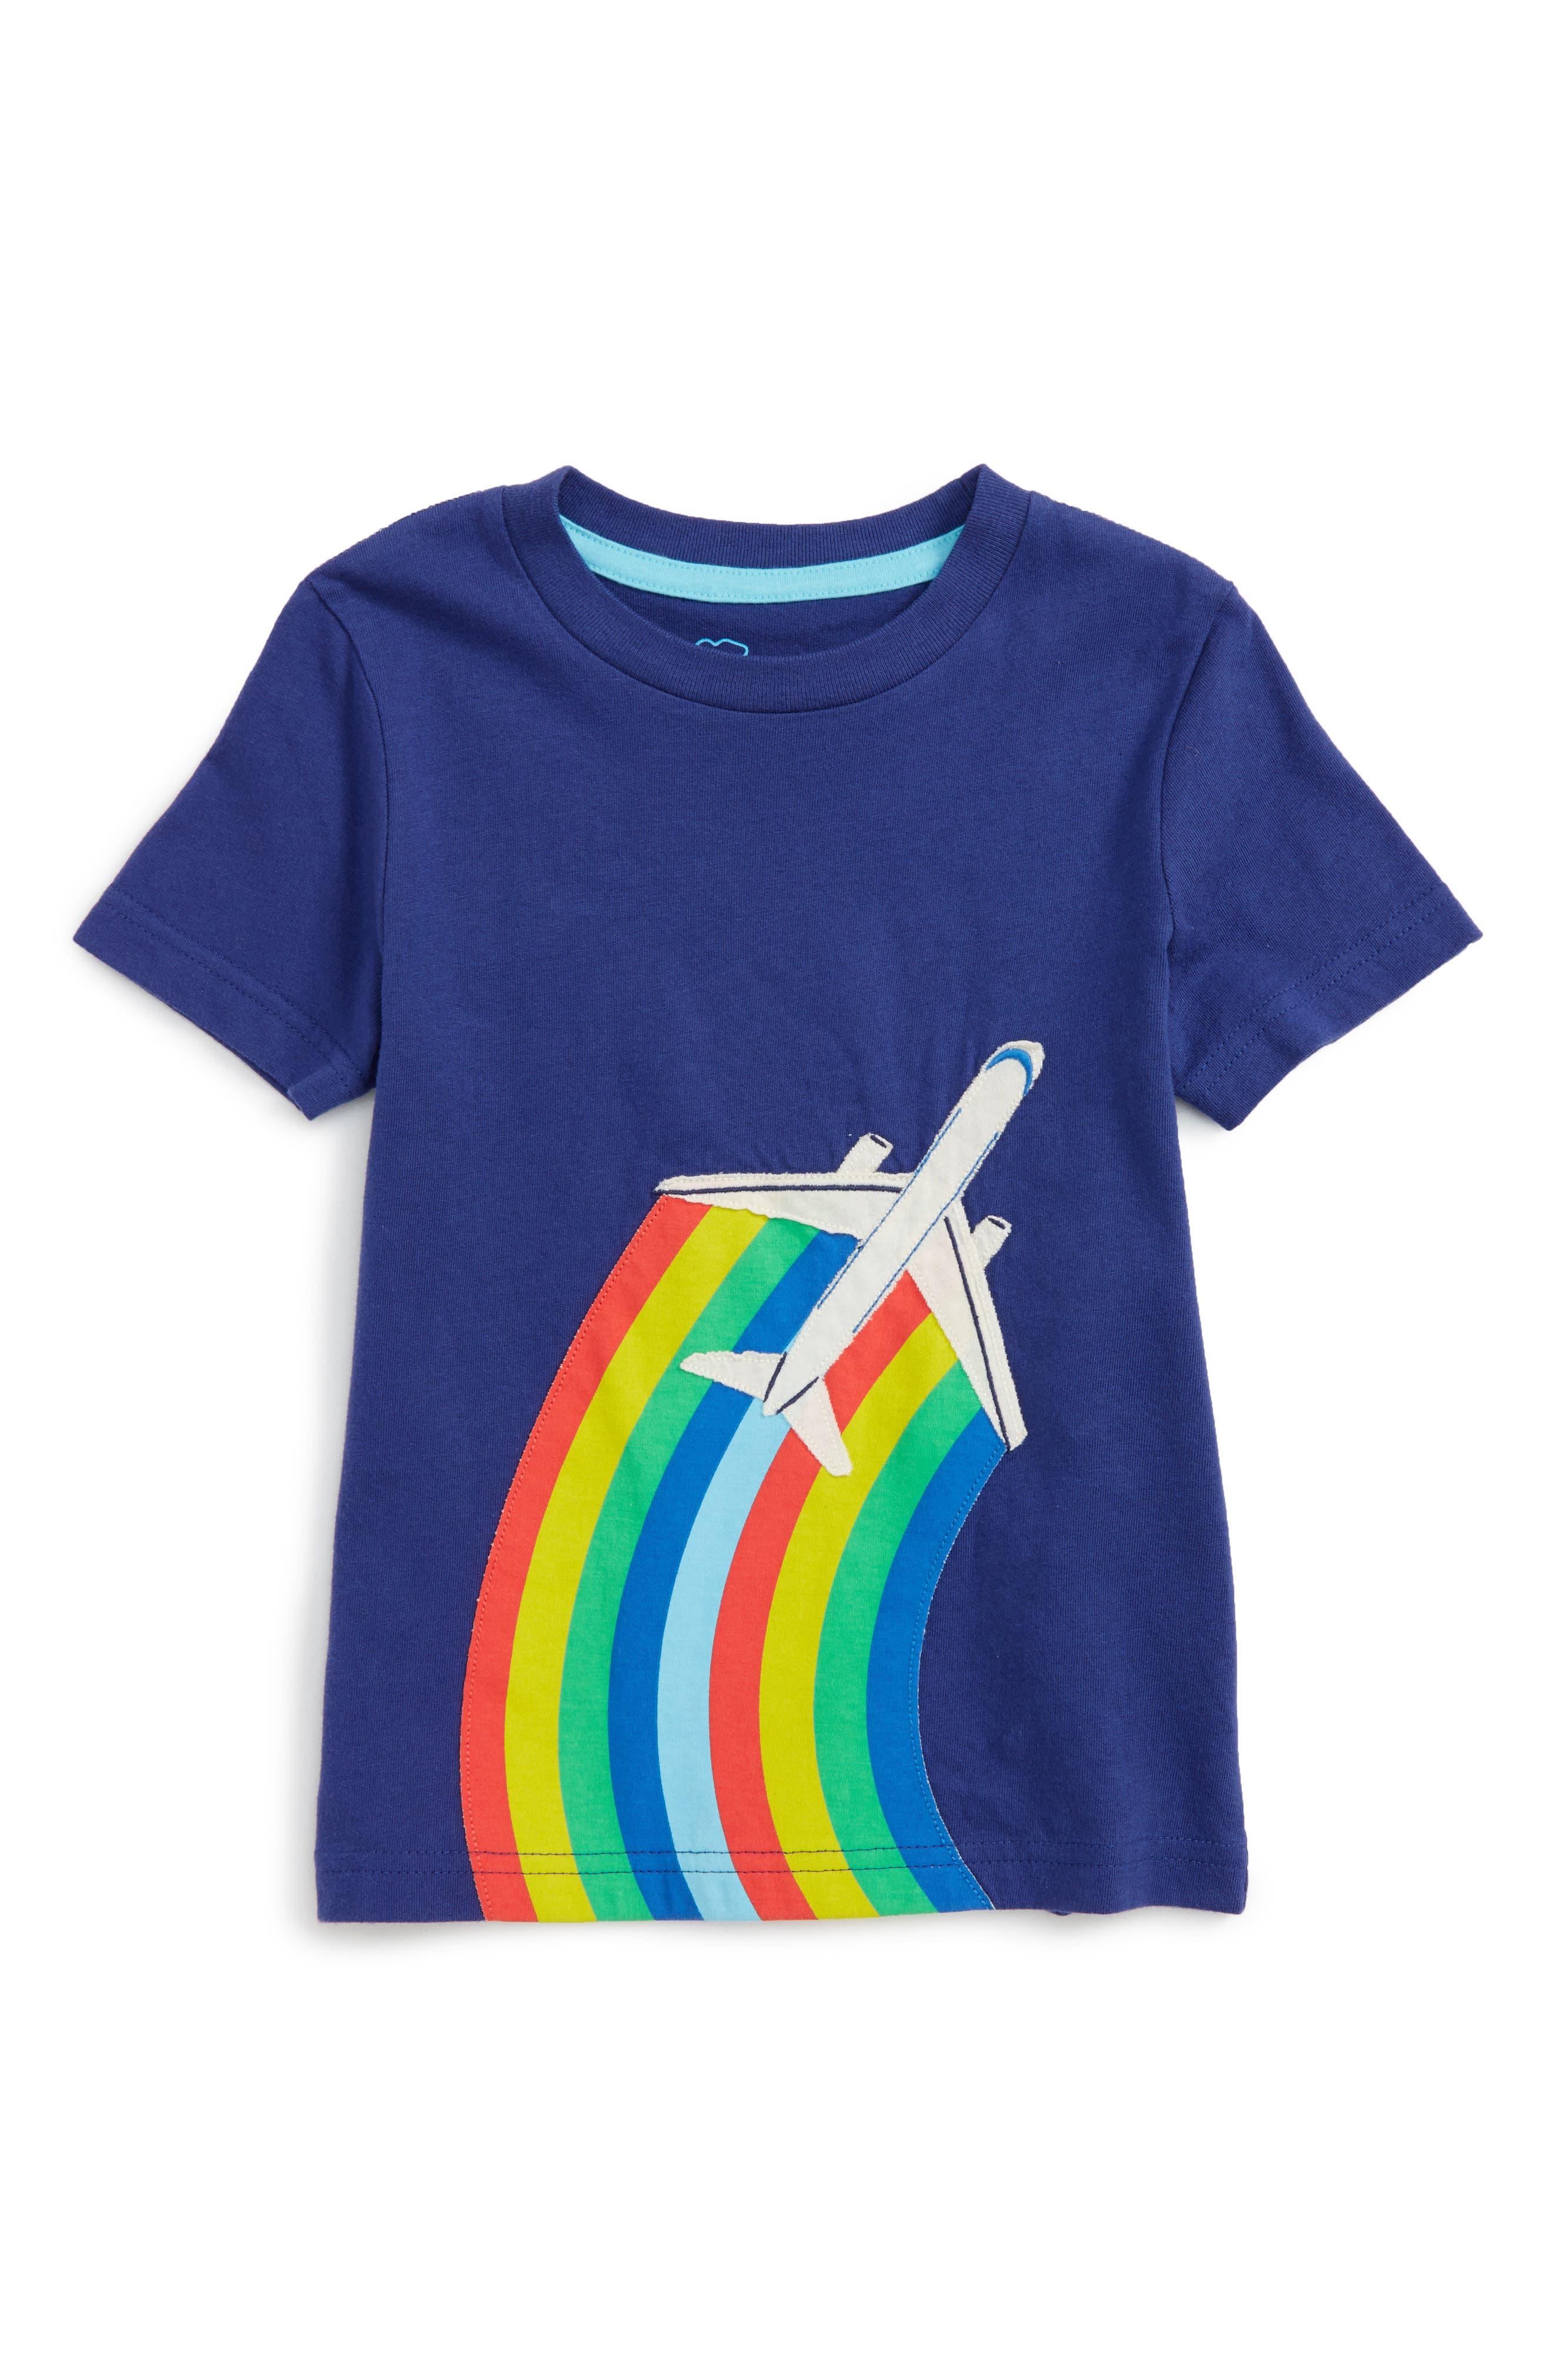 Alternate Image 1 Selected - Mini Boden Travel Appliqué T-Shirt (Toddler Boys, Little Boys & Big Boys)